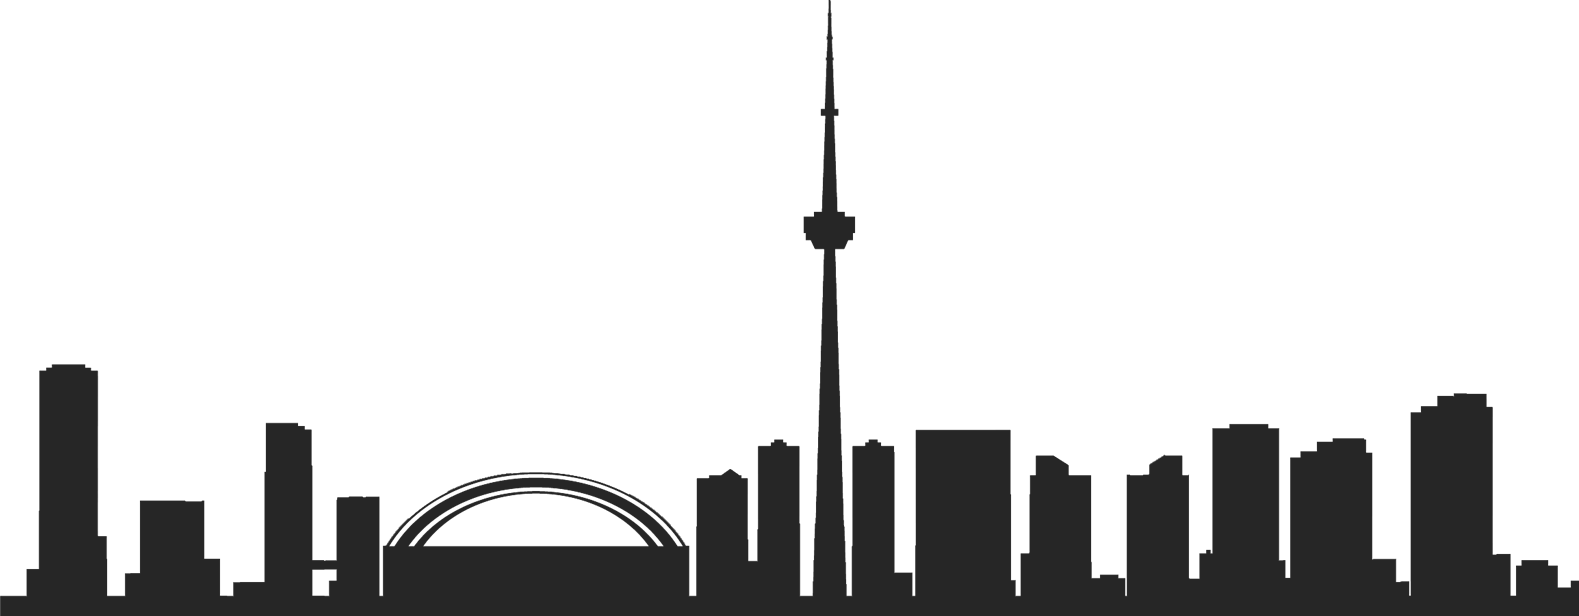 Toronto png 4 » PNG Image.